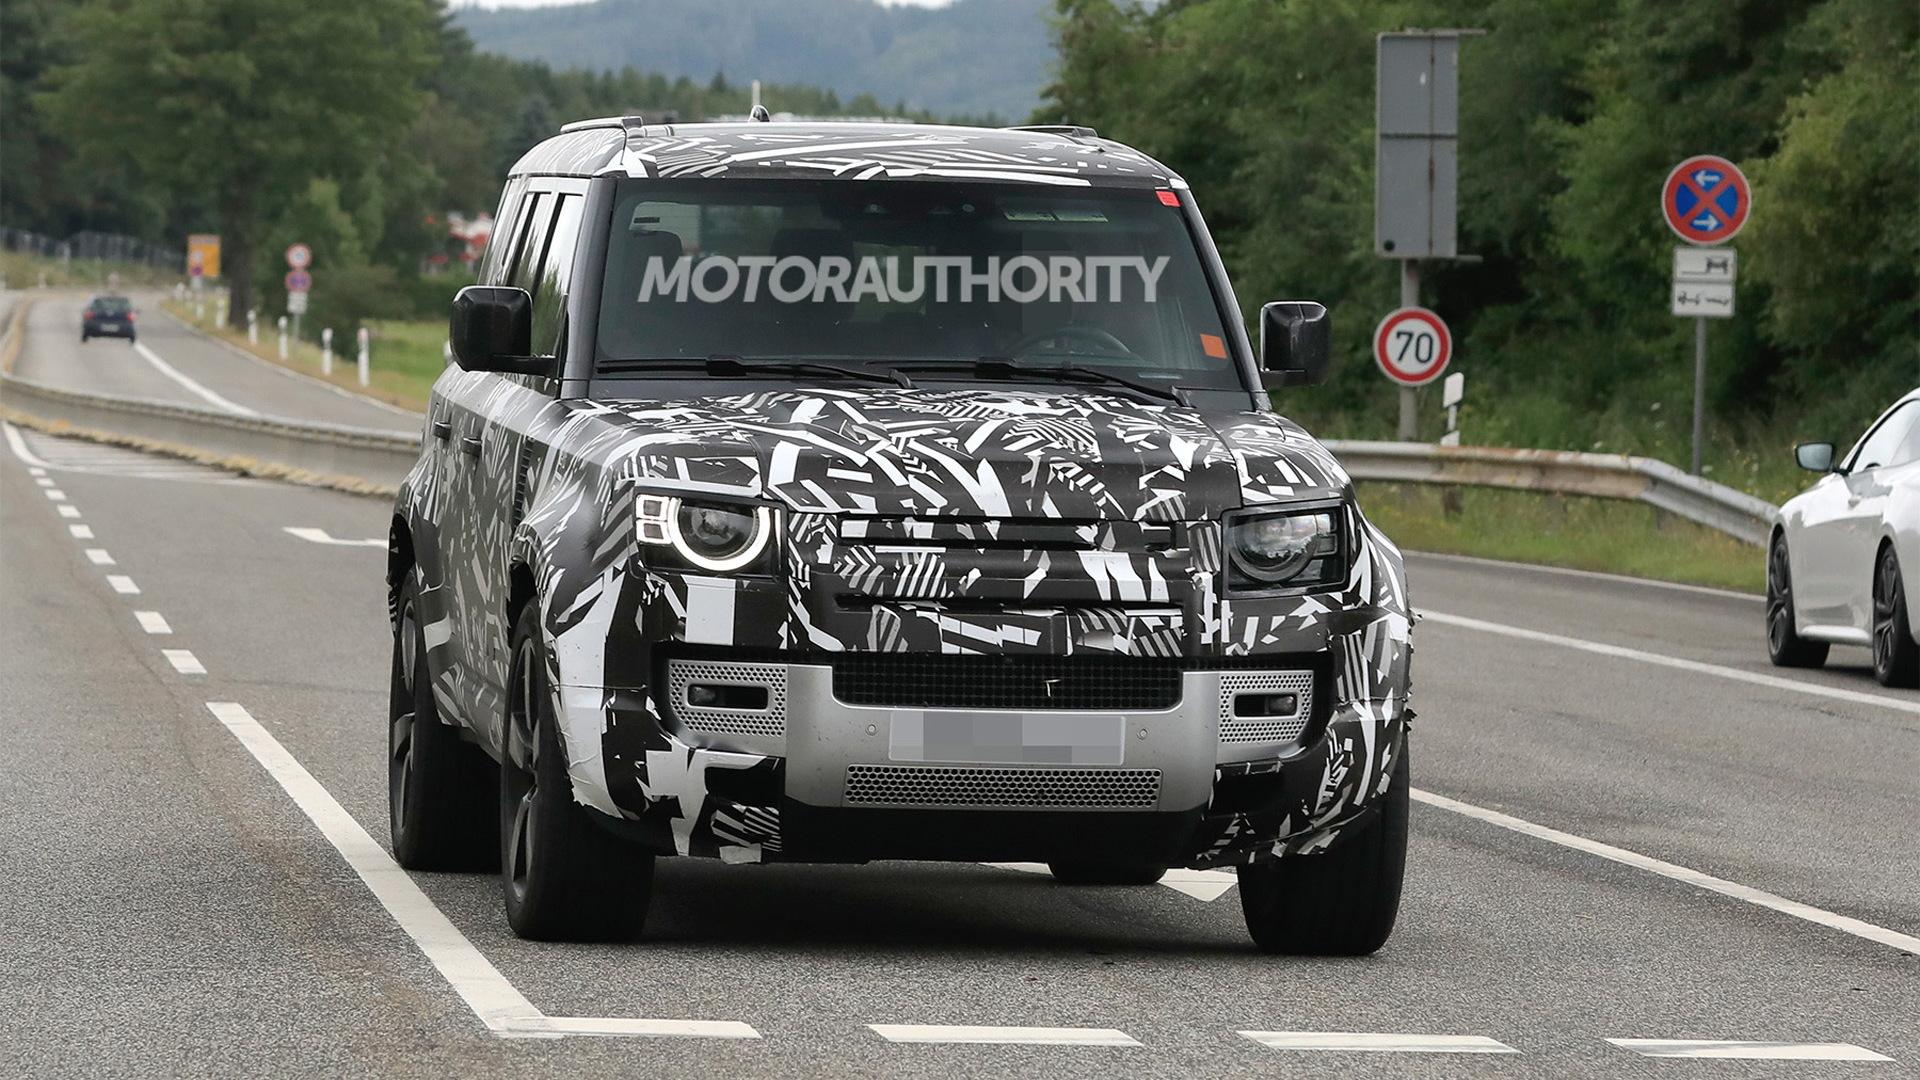 2023 Land Rover Defender 130 spy shots - Photo credit:S. Baldauf/SB-Medien